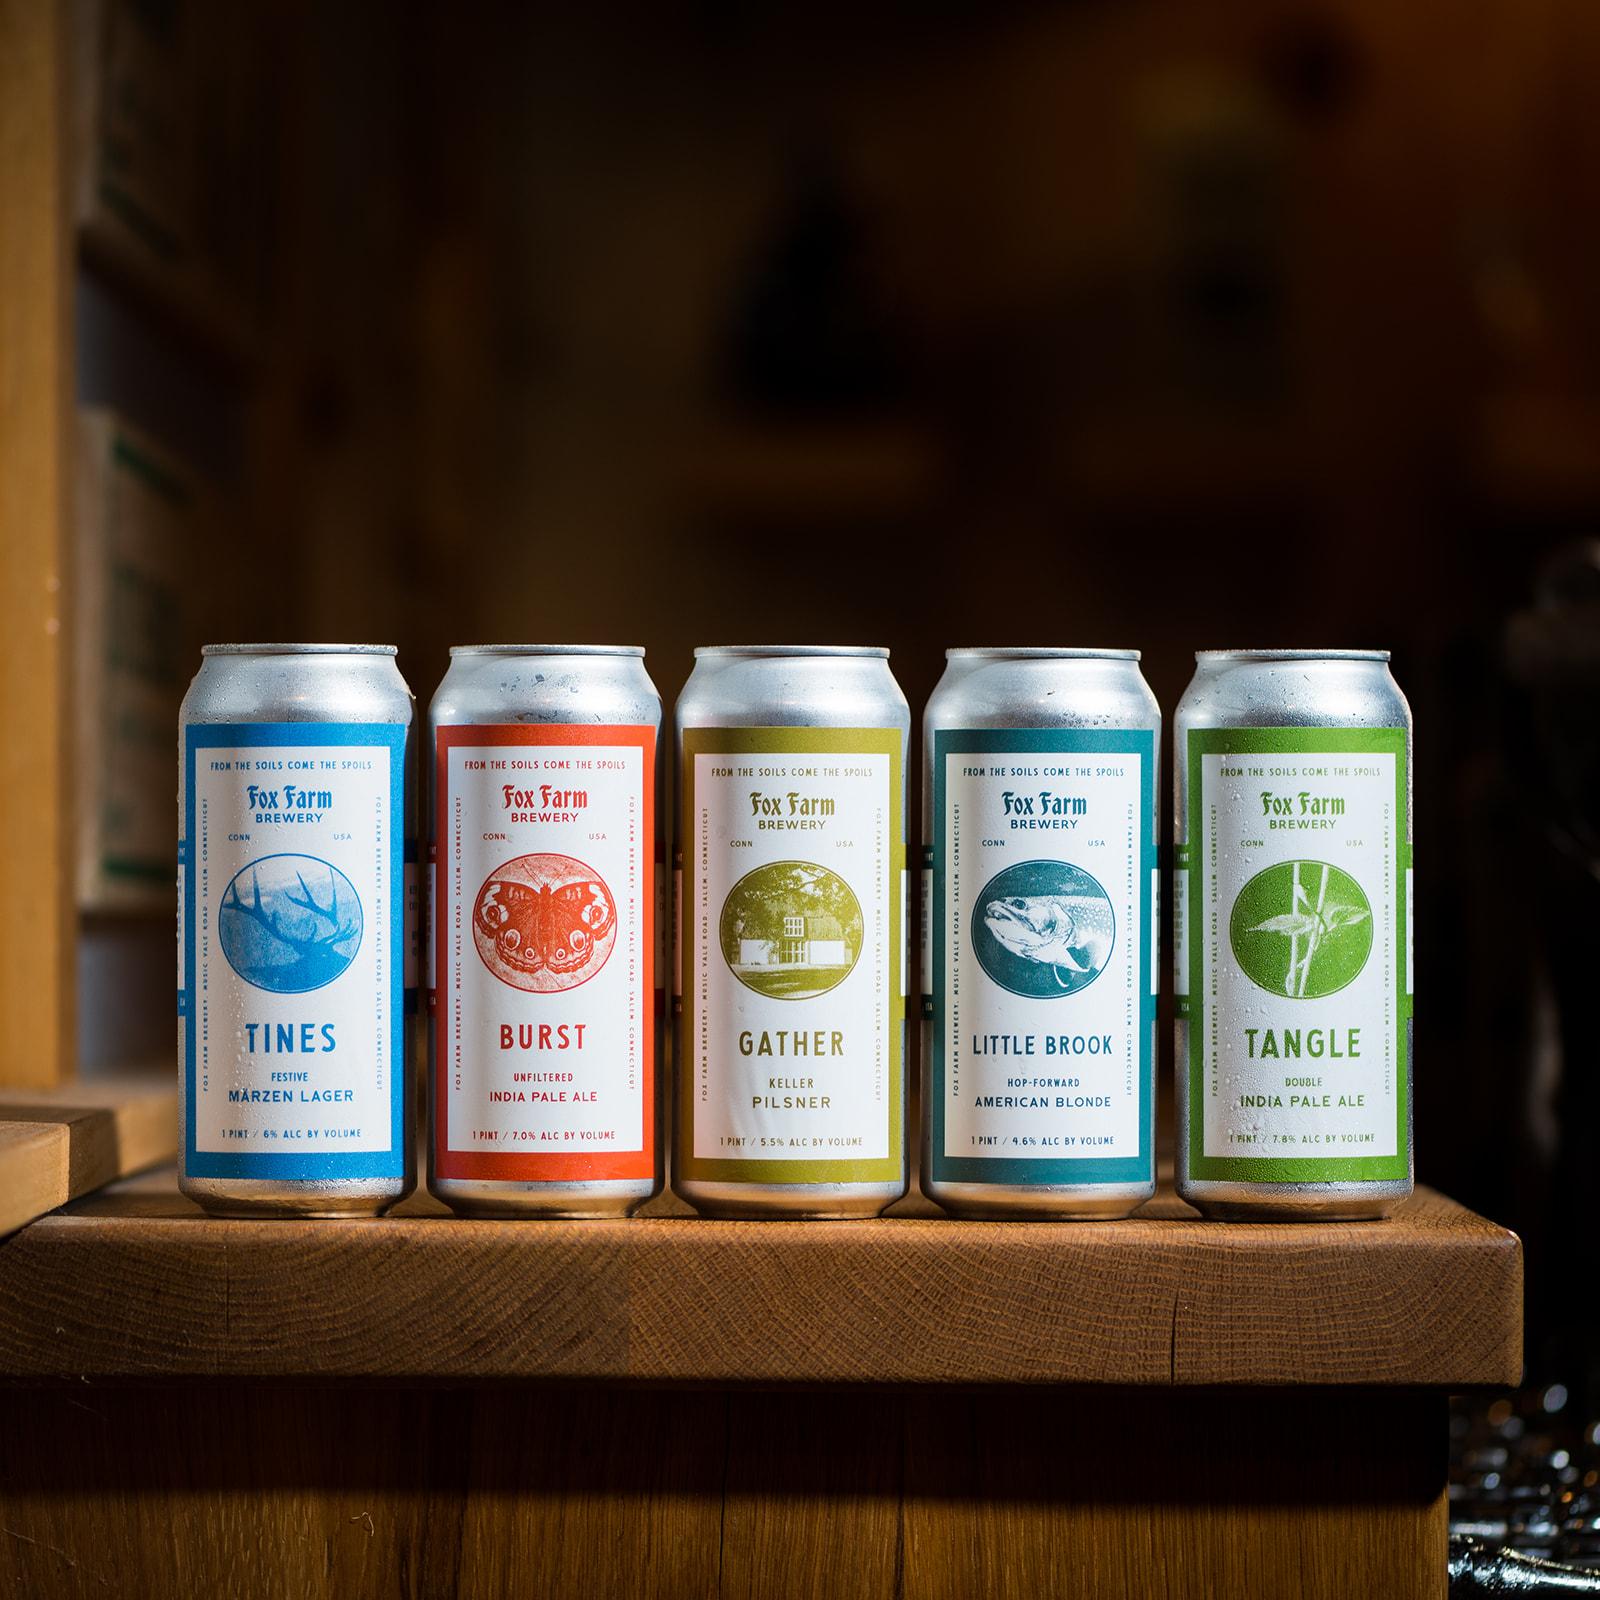 Beer & Branding: Fox Farm